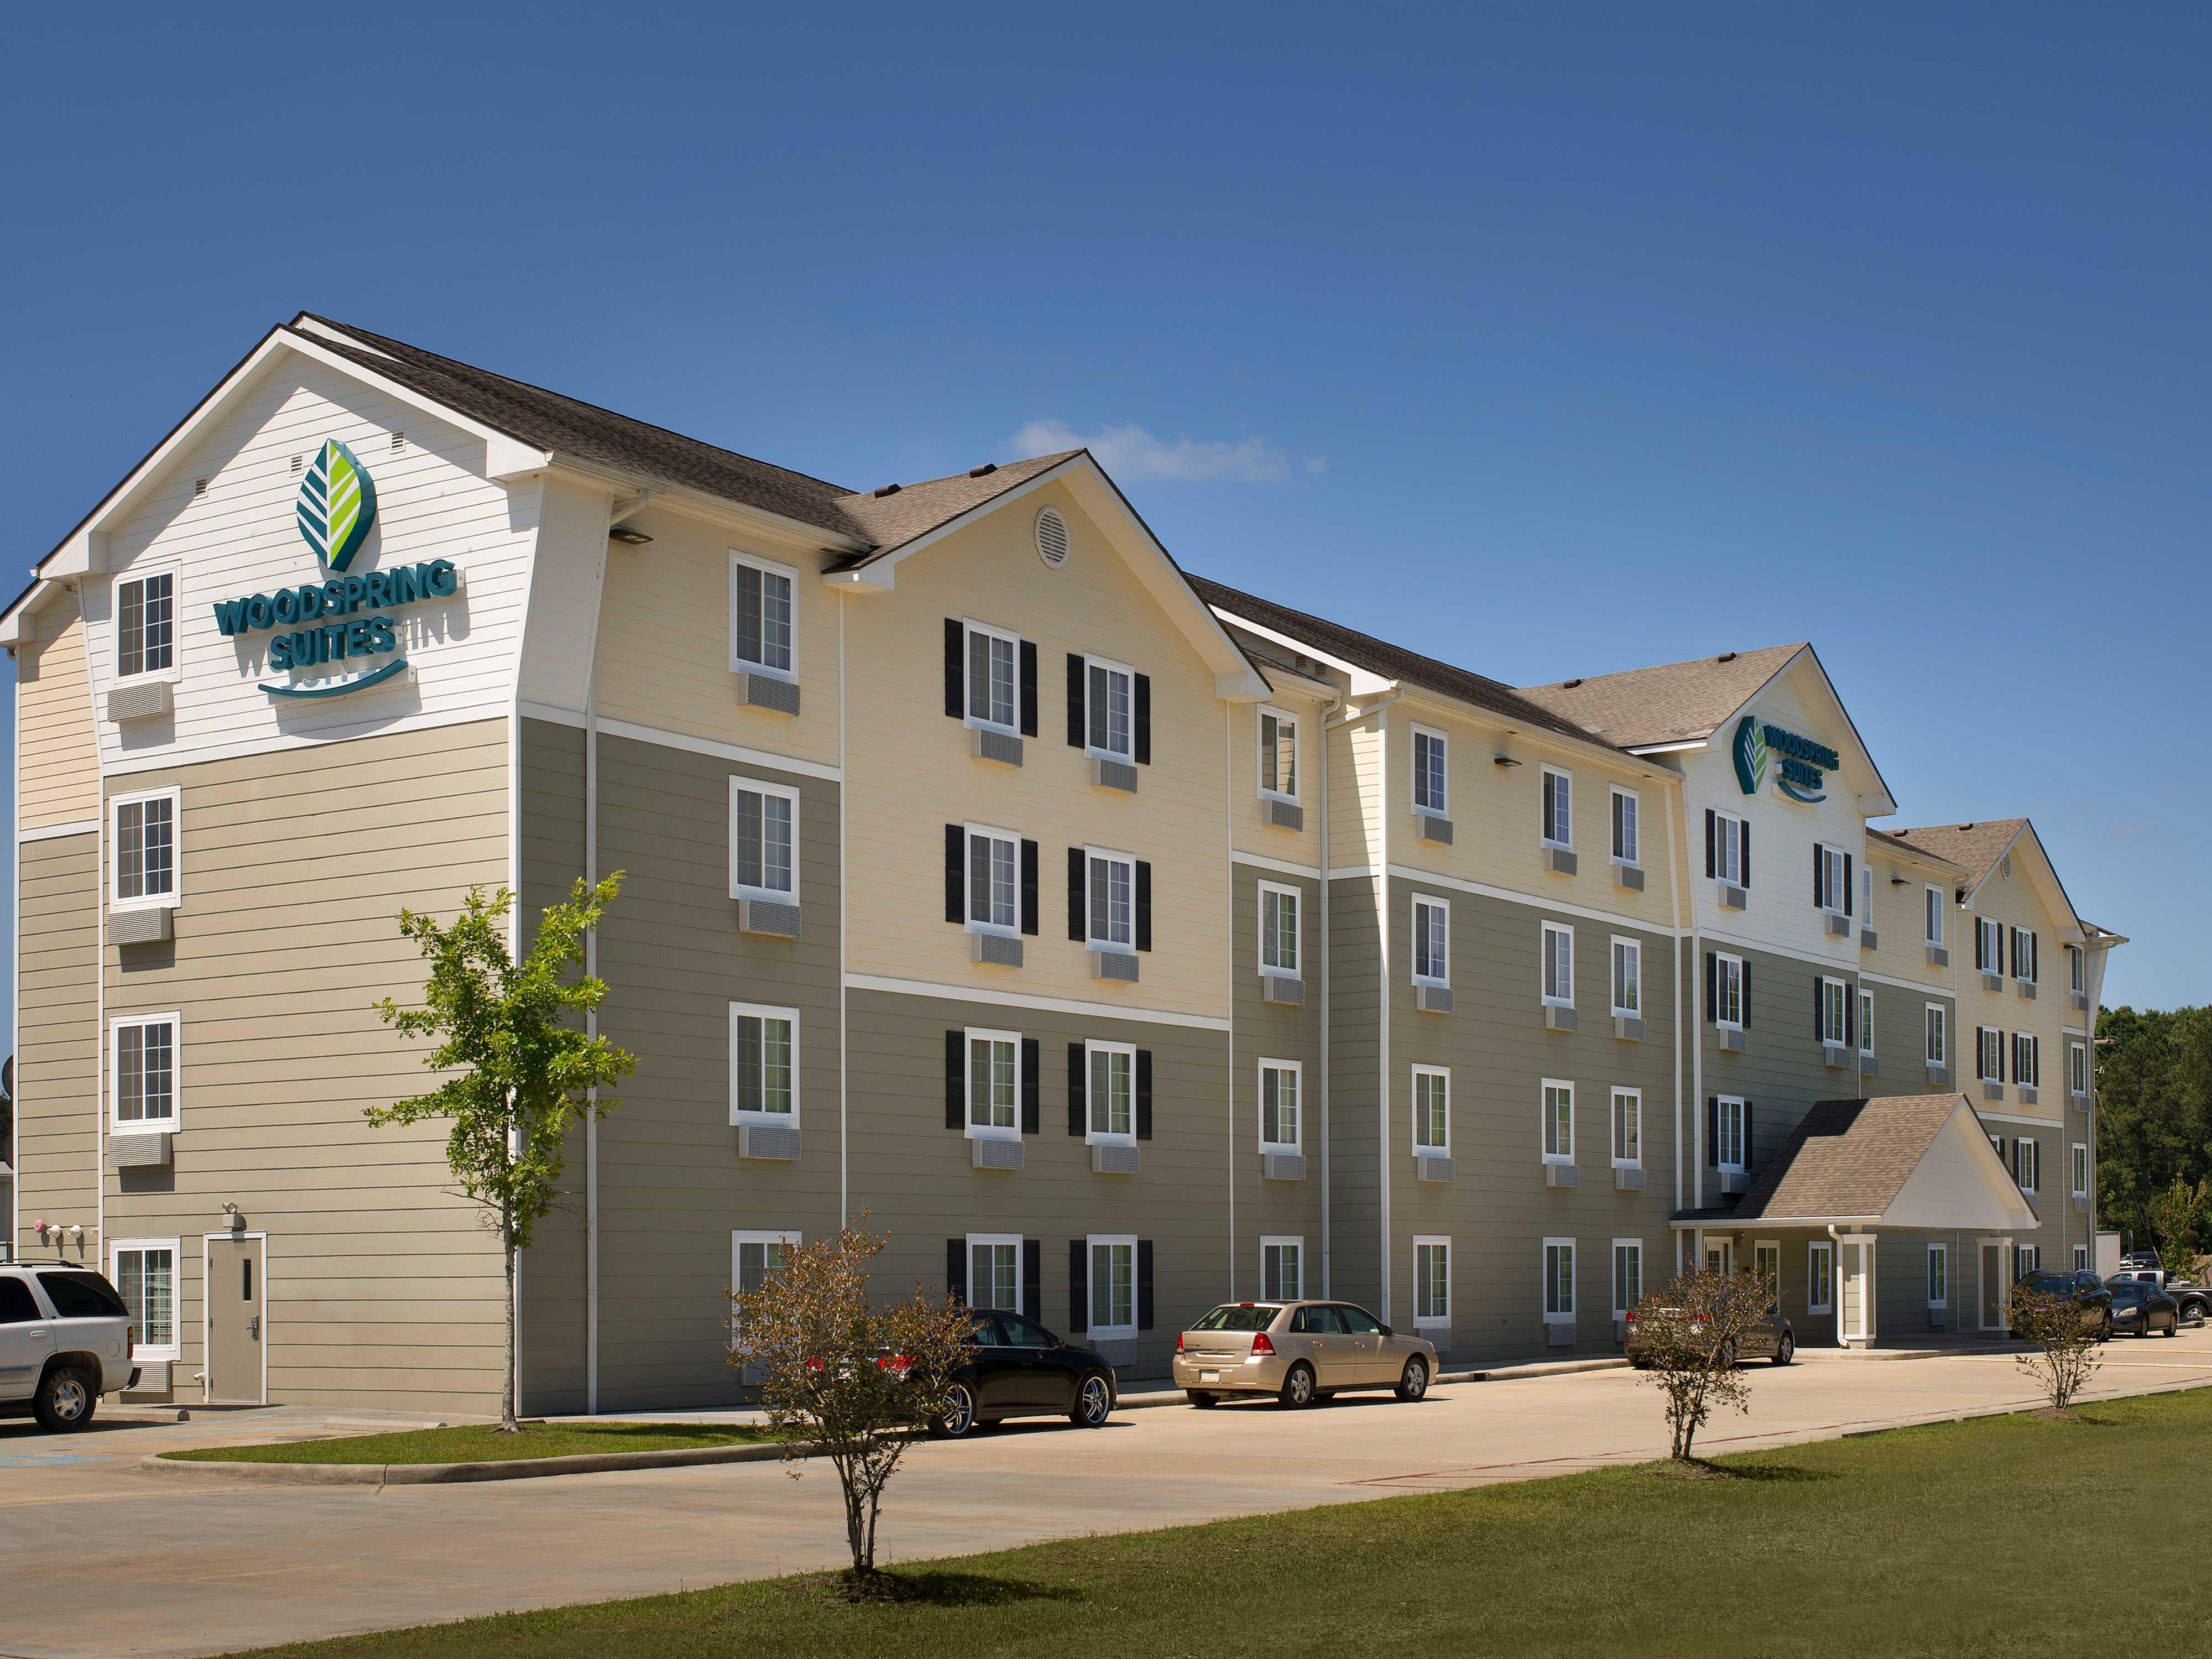 Extended Stay Hotels In Hammond La